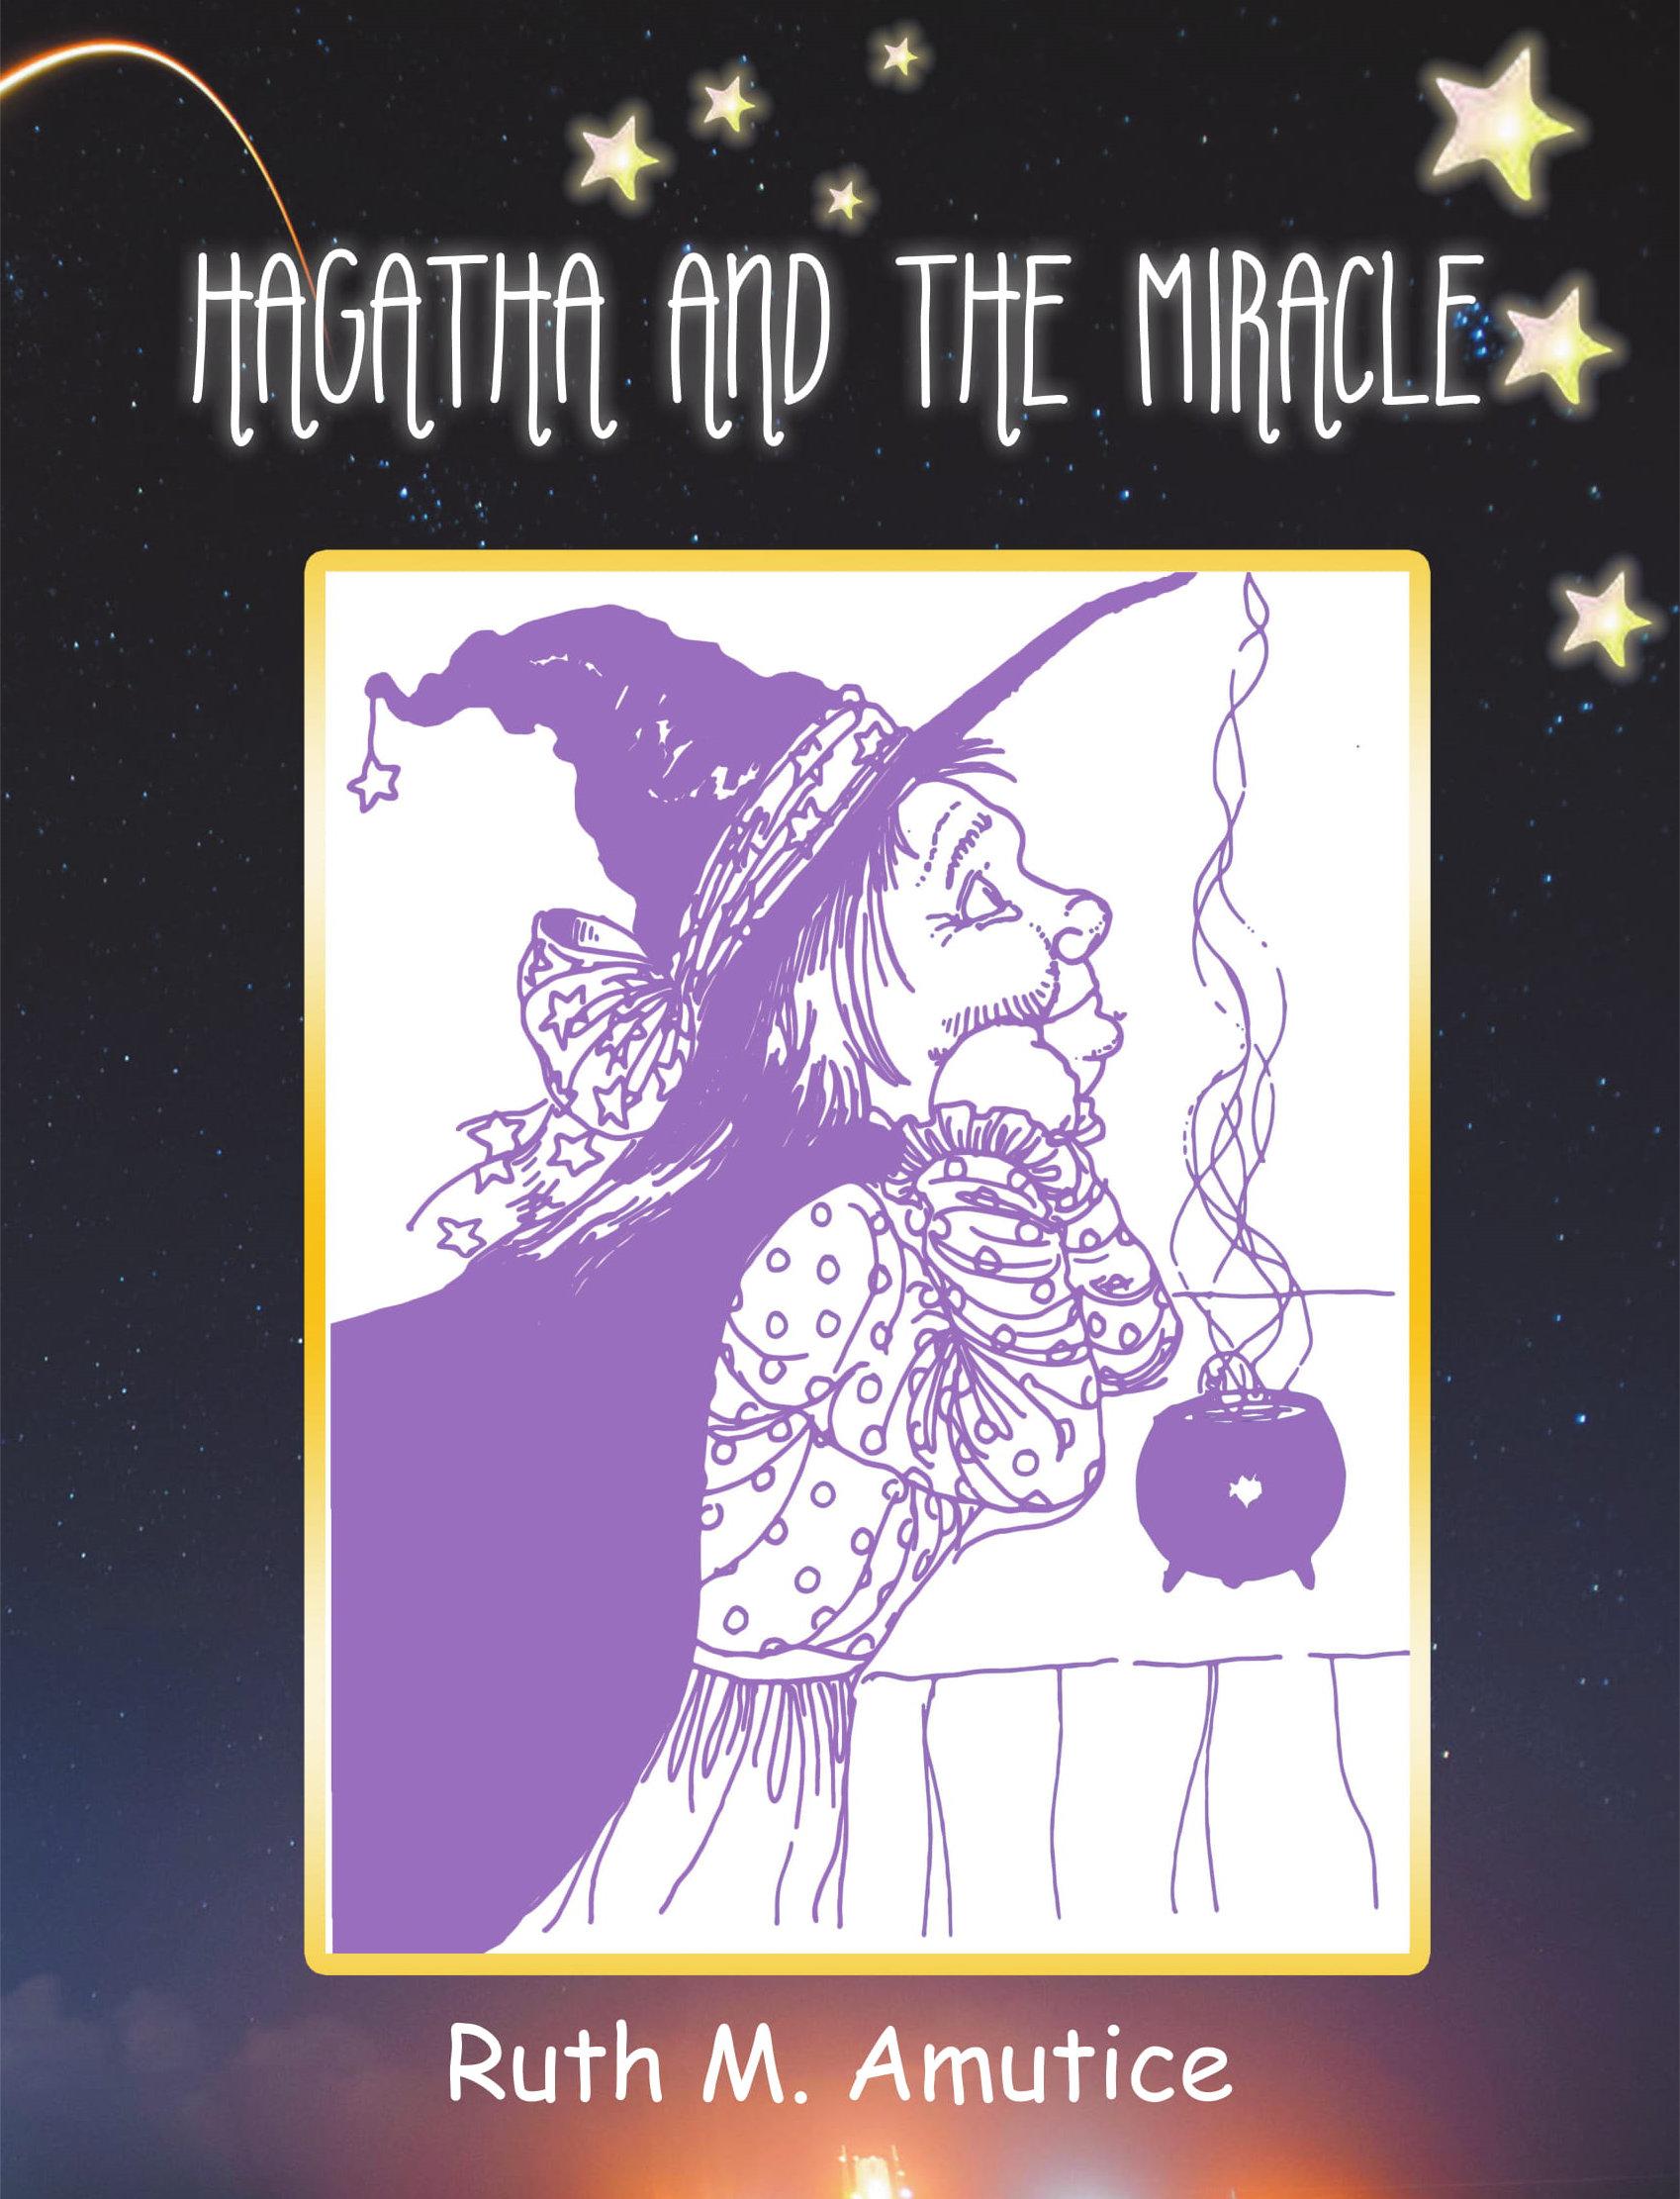 Ruth M. Amutice - Hagatha and the Miracle